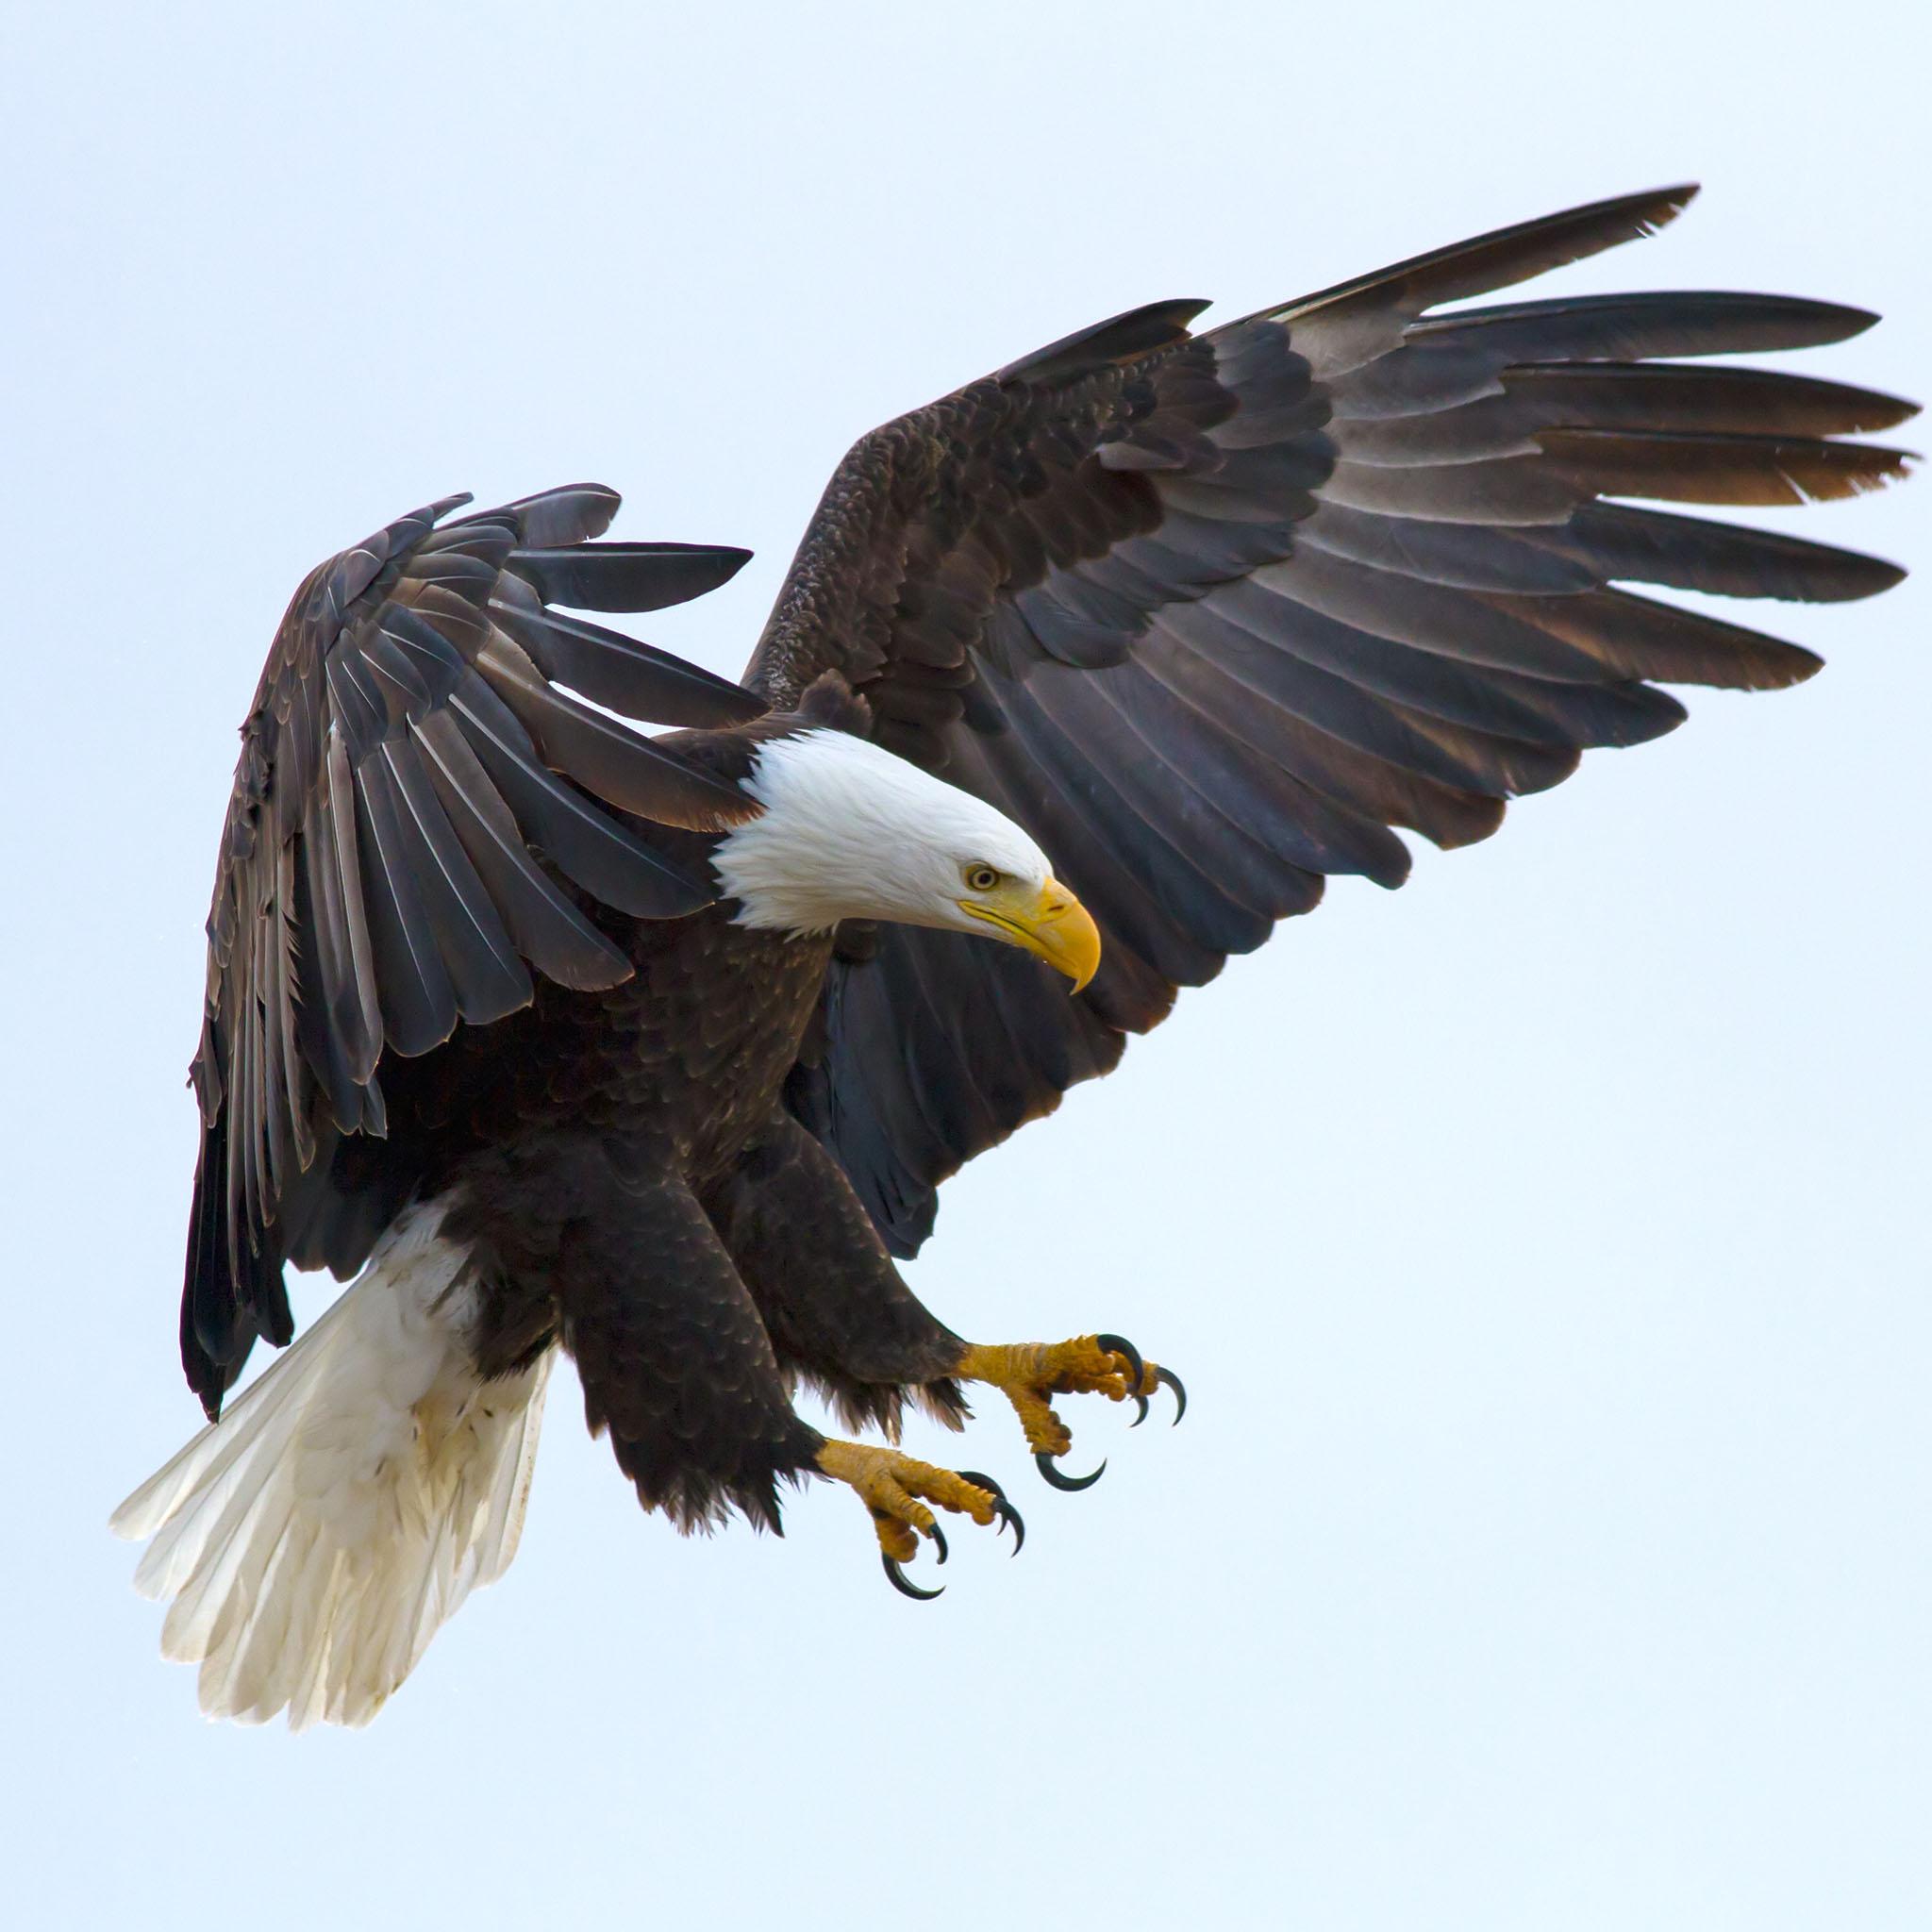 Eagle Backgrounds on Wallpapers Vista